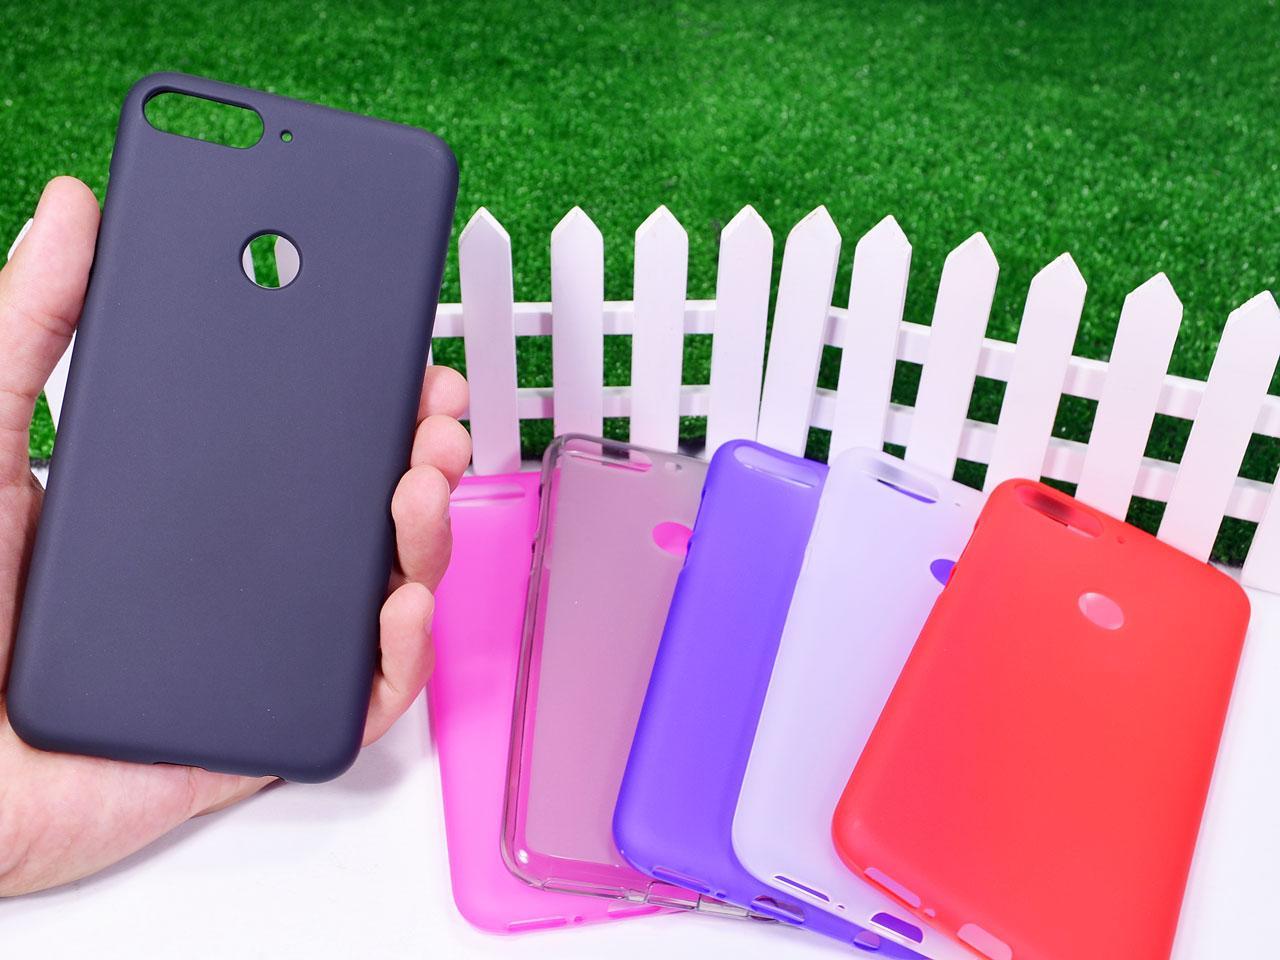 Силиконовый TPU чехол для Huawei Honor 7C (LND-AL30, LND-AL40) / Honor 7C Pro (LND-L29) / Enjoy 8